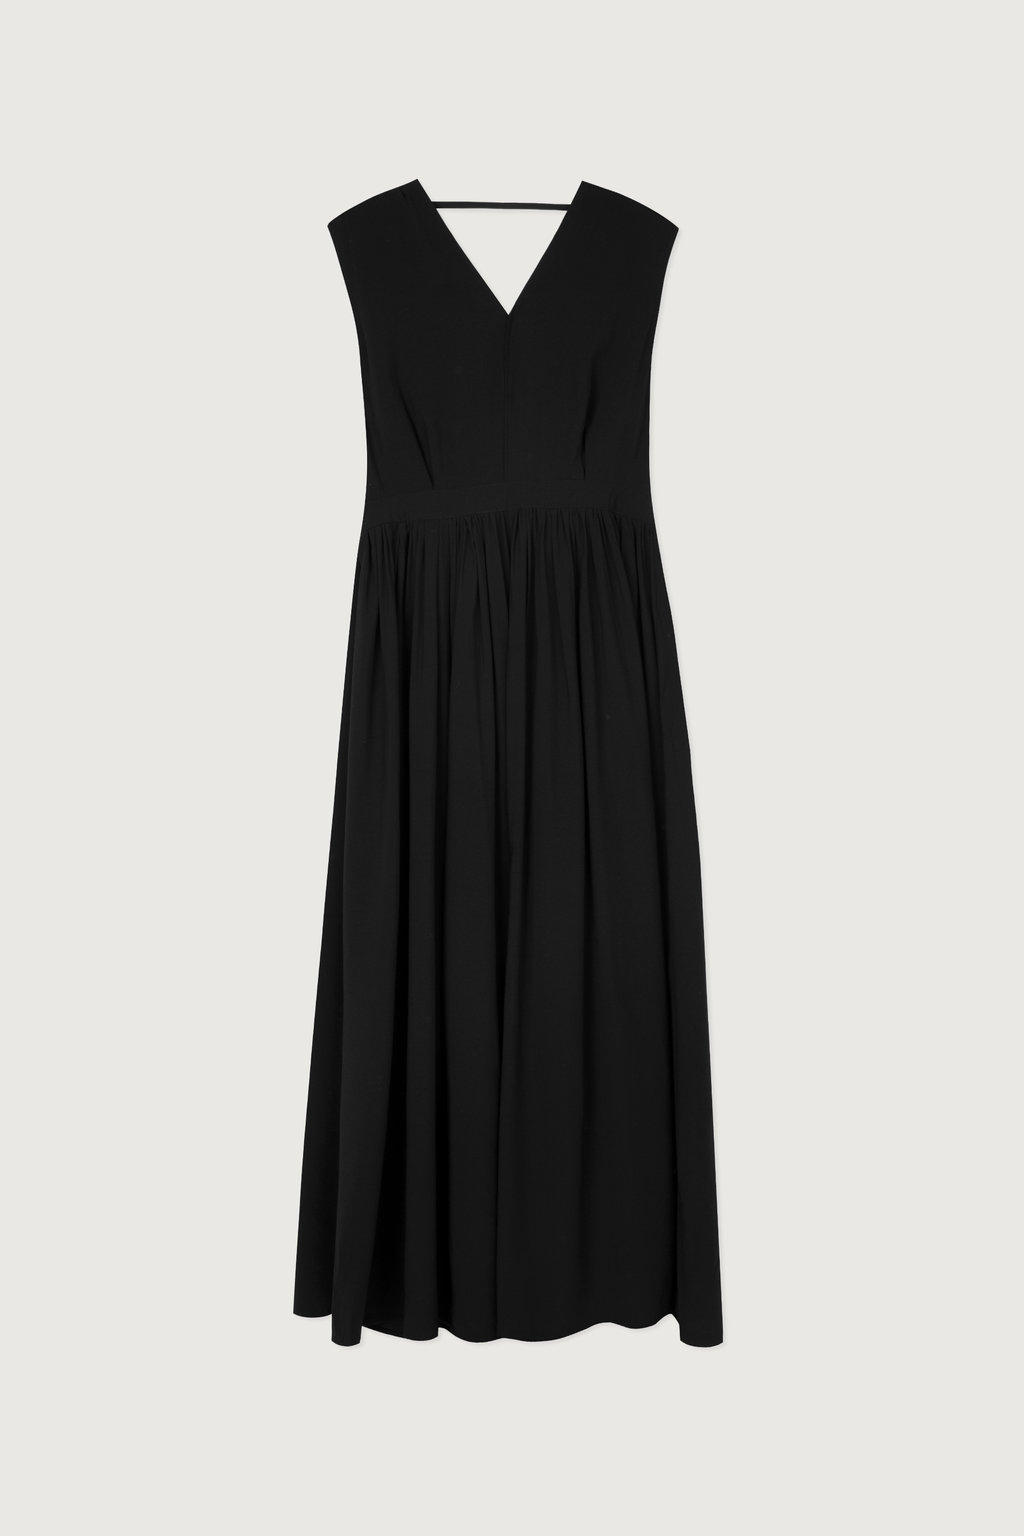 Dress K0231 Black 7